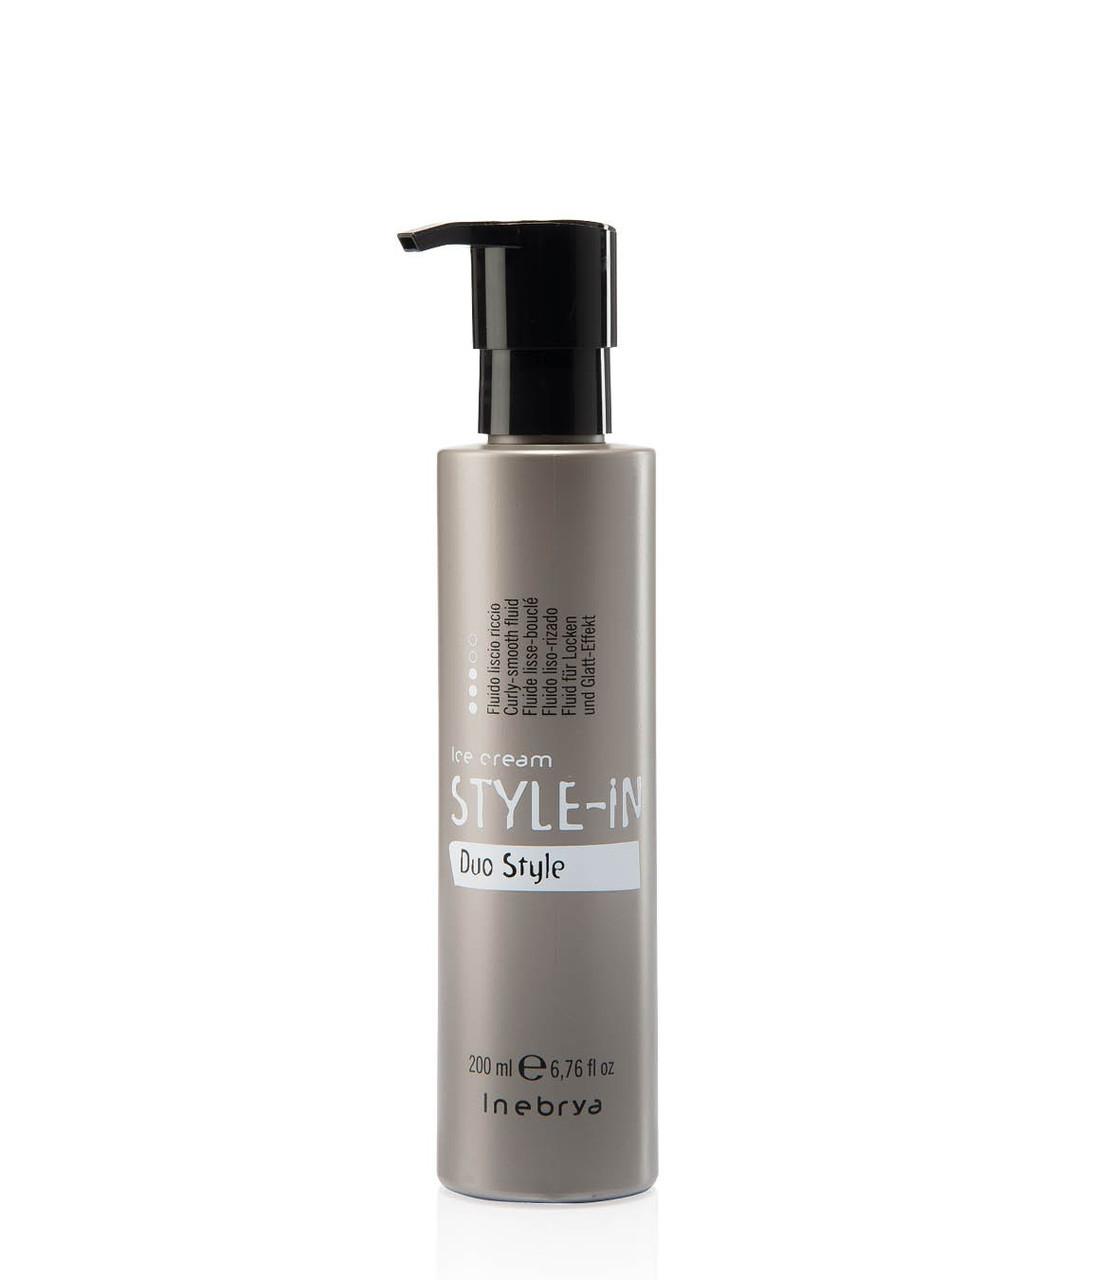 Флюид для завивки или выпрямления волос Inebrya Style-In Fluido Duo Style 200мл